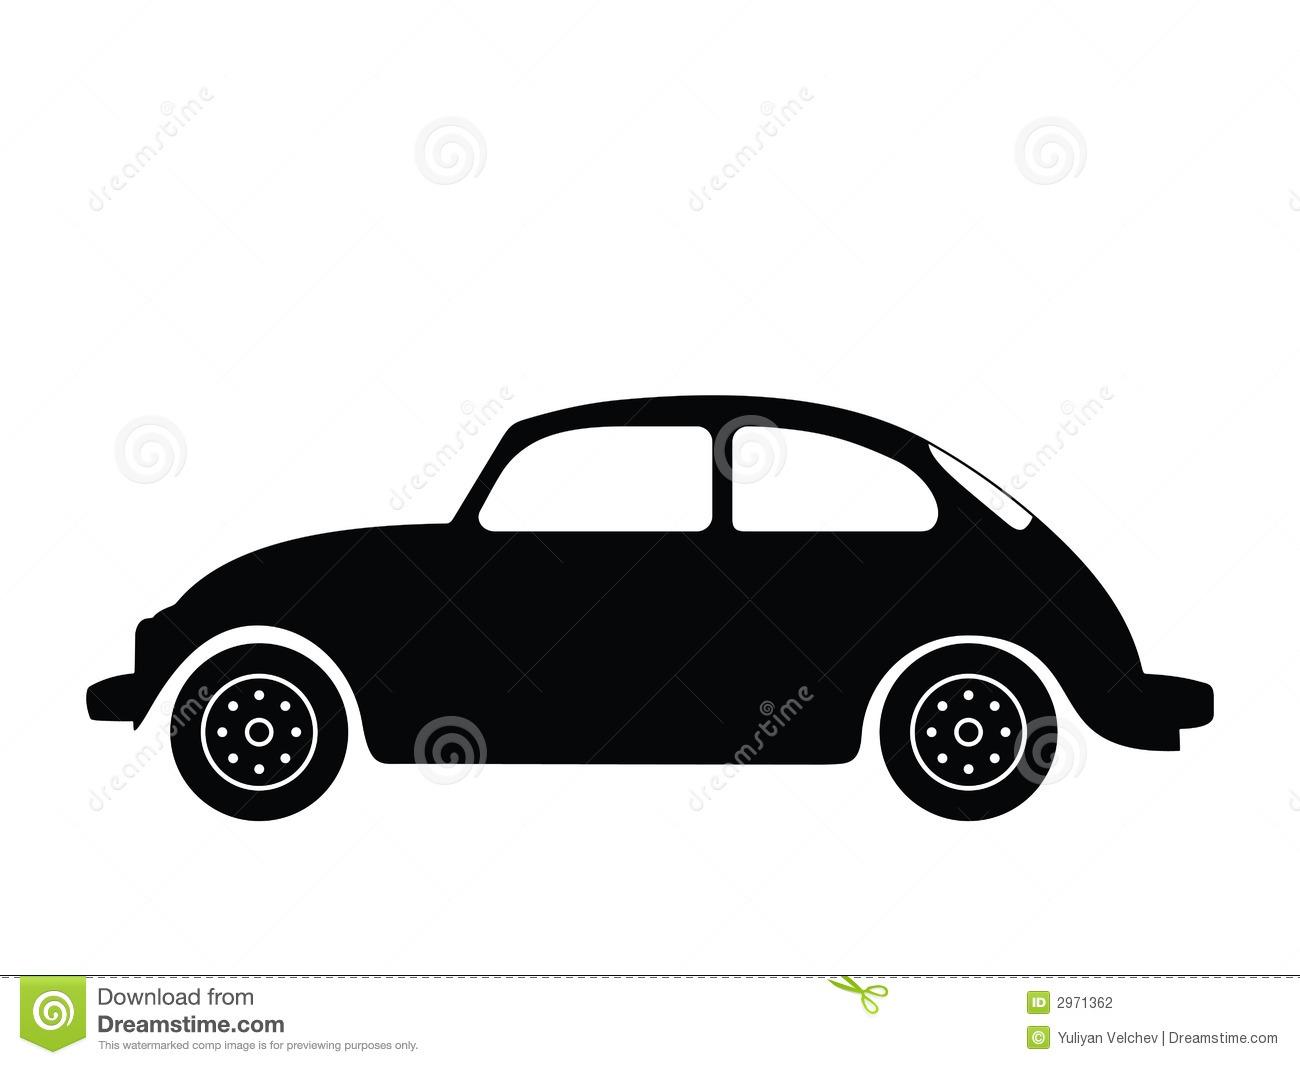 Bug Car Silhouette Clipart.